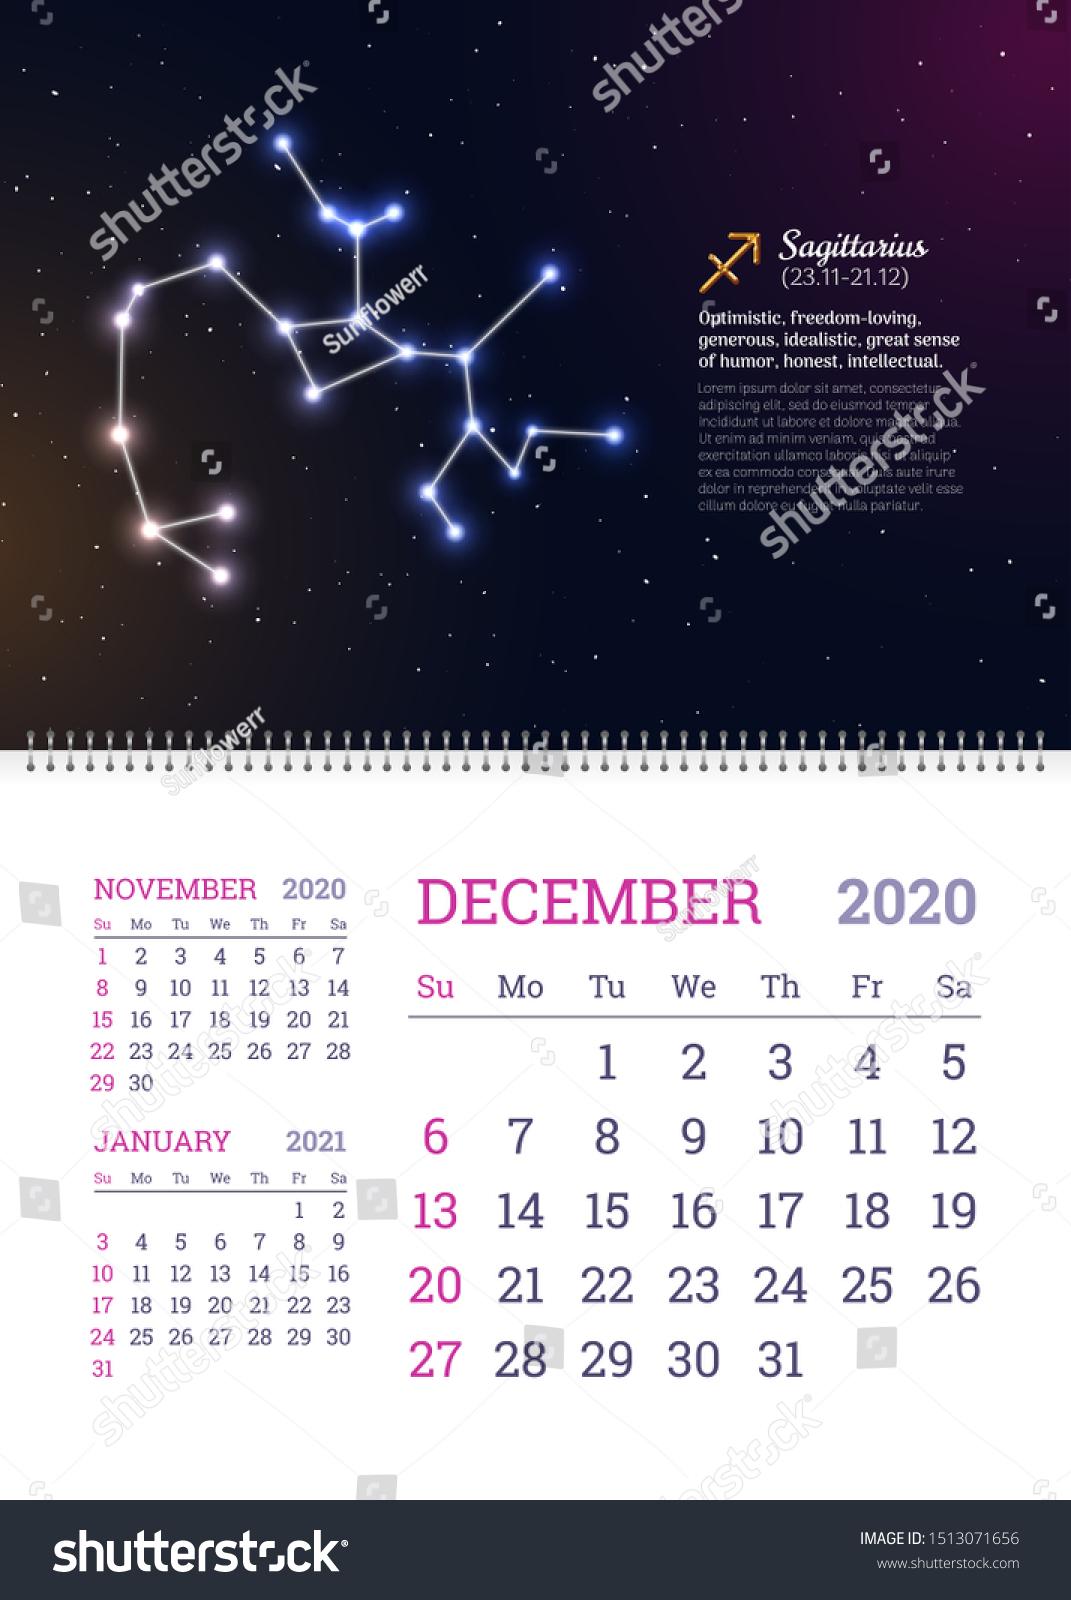 Стоковая Векторная Графика «Wall Calendar December 2020 Year